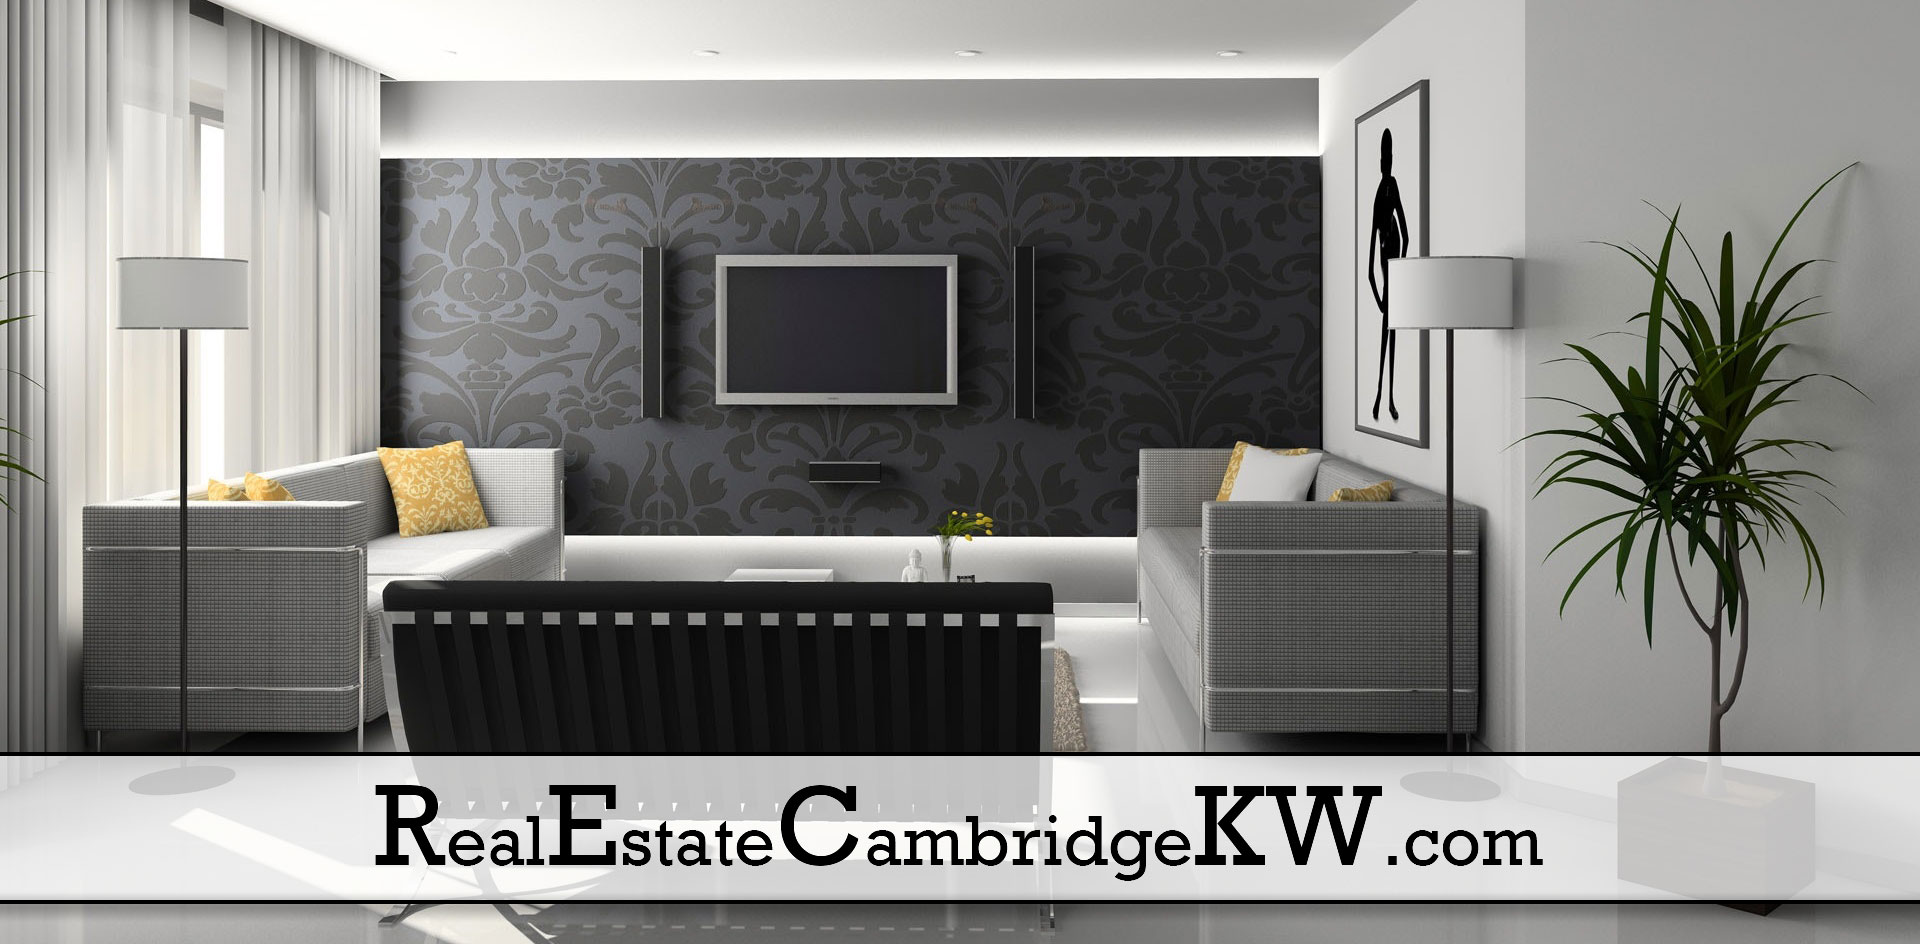 Real Estate Cambridge Banner 3